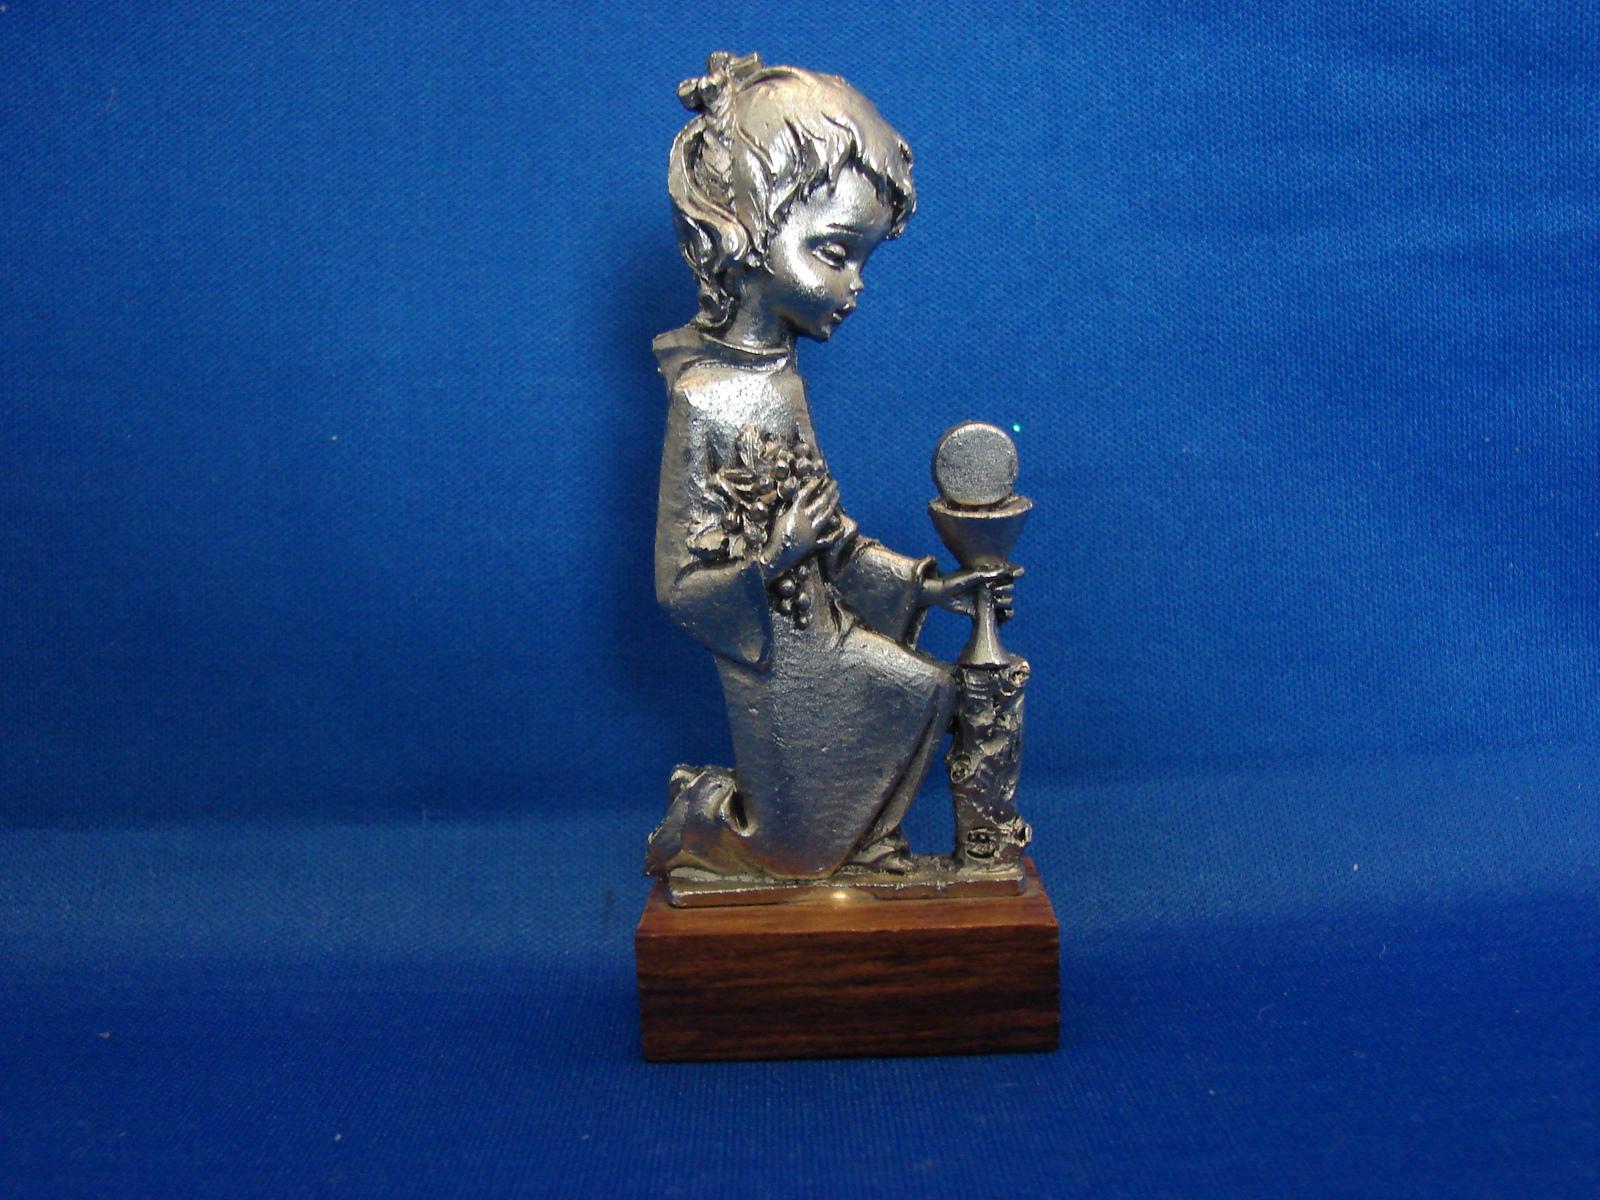 Peltro Pewter Figurine Little Girl Wood Base and 11 similar